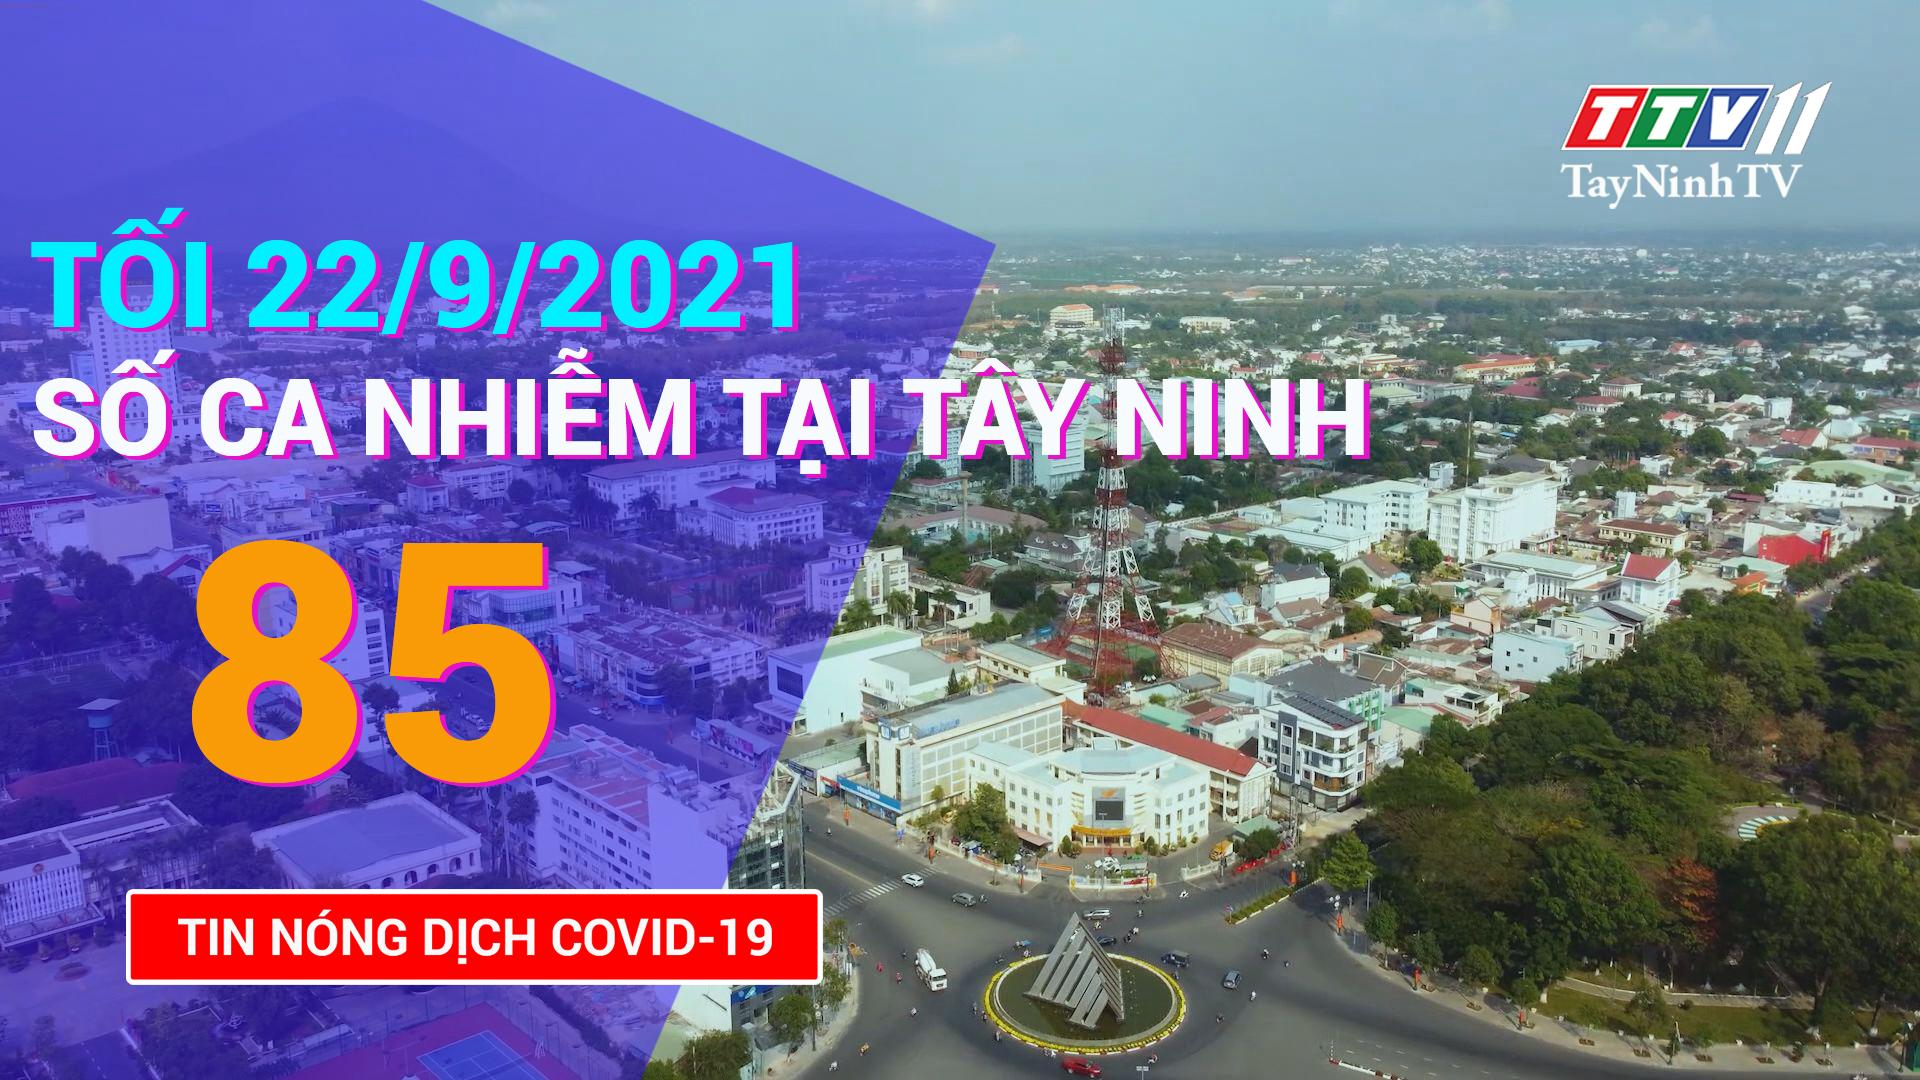 Tin tức Covid-19 tối 22/9/2021 | TayNinhTV